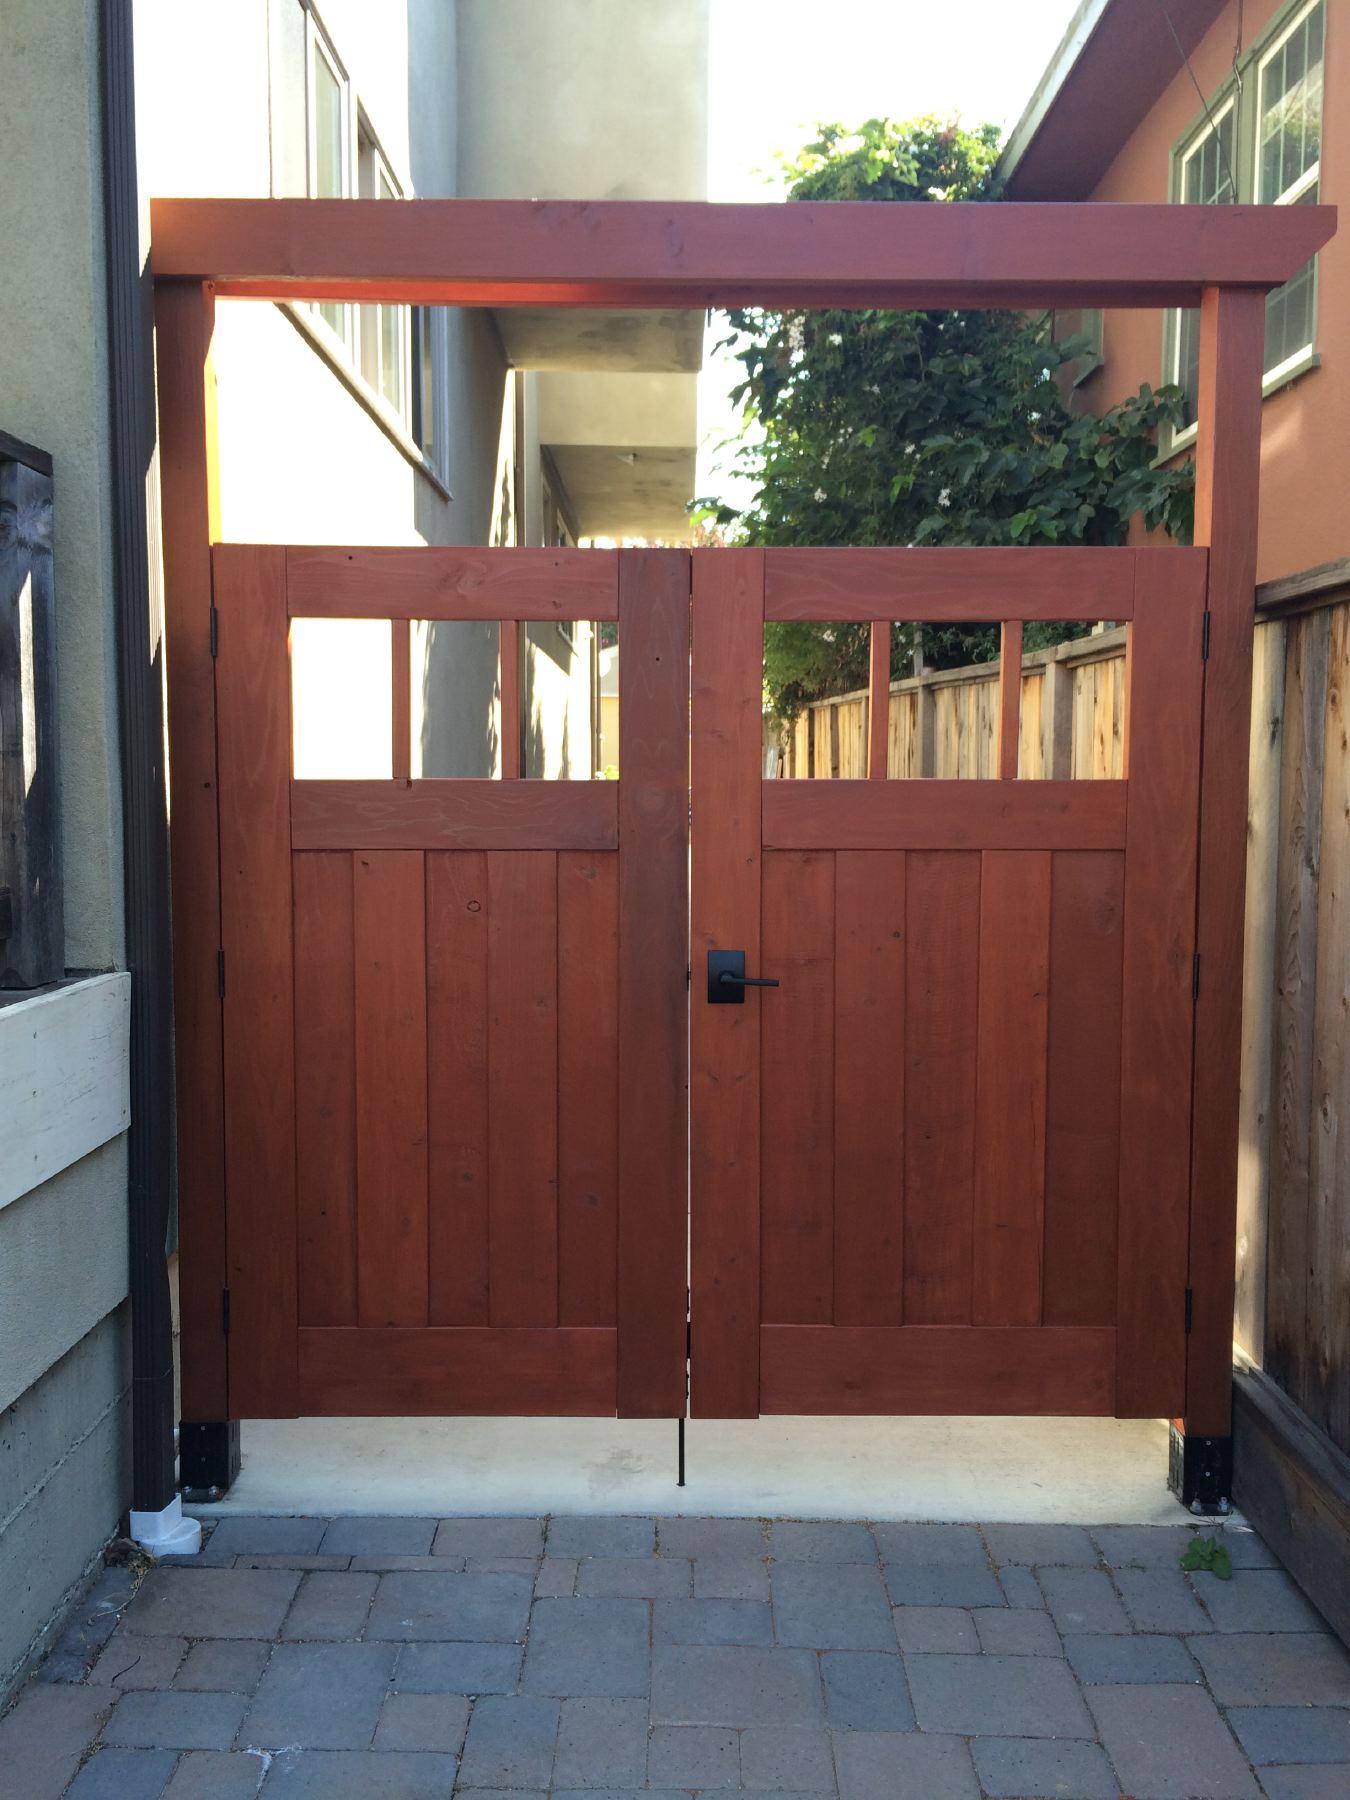 Redwood Craftsman gate & Finished DIY Redwood Craftsman Fence Gate u2013 Shirley u0026 Chris projects ...